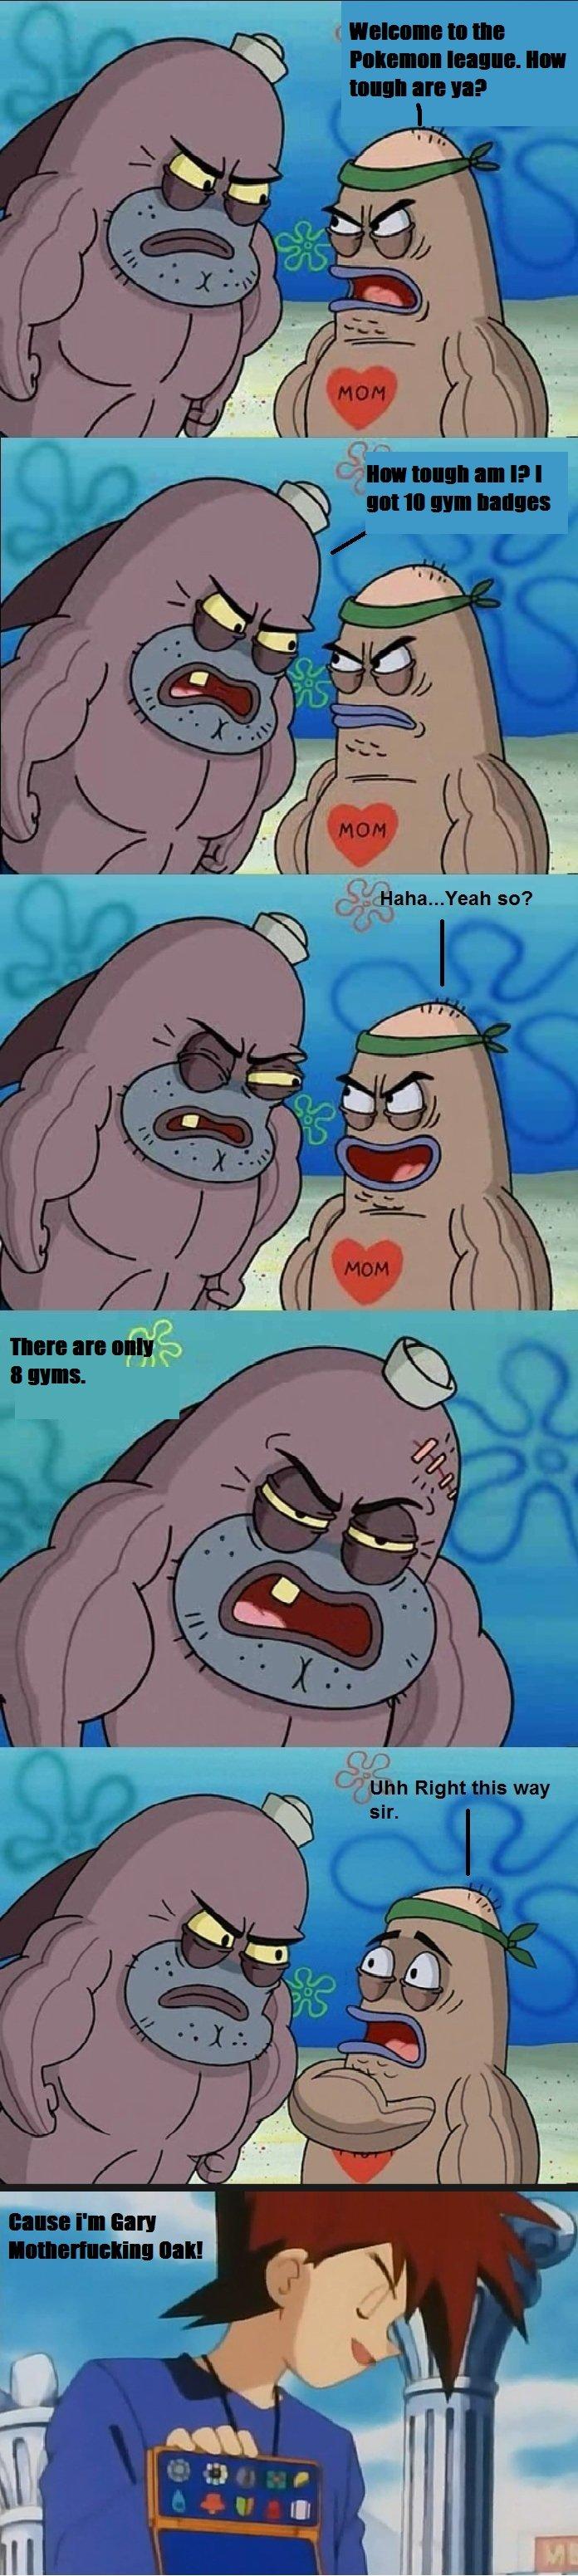 Funny Being Salty Memes of 2017 on me.me | Bootiful |Salty Girl Meme